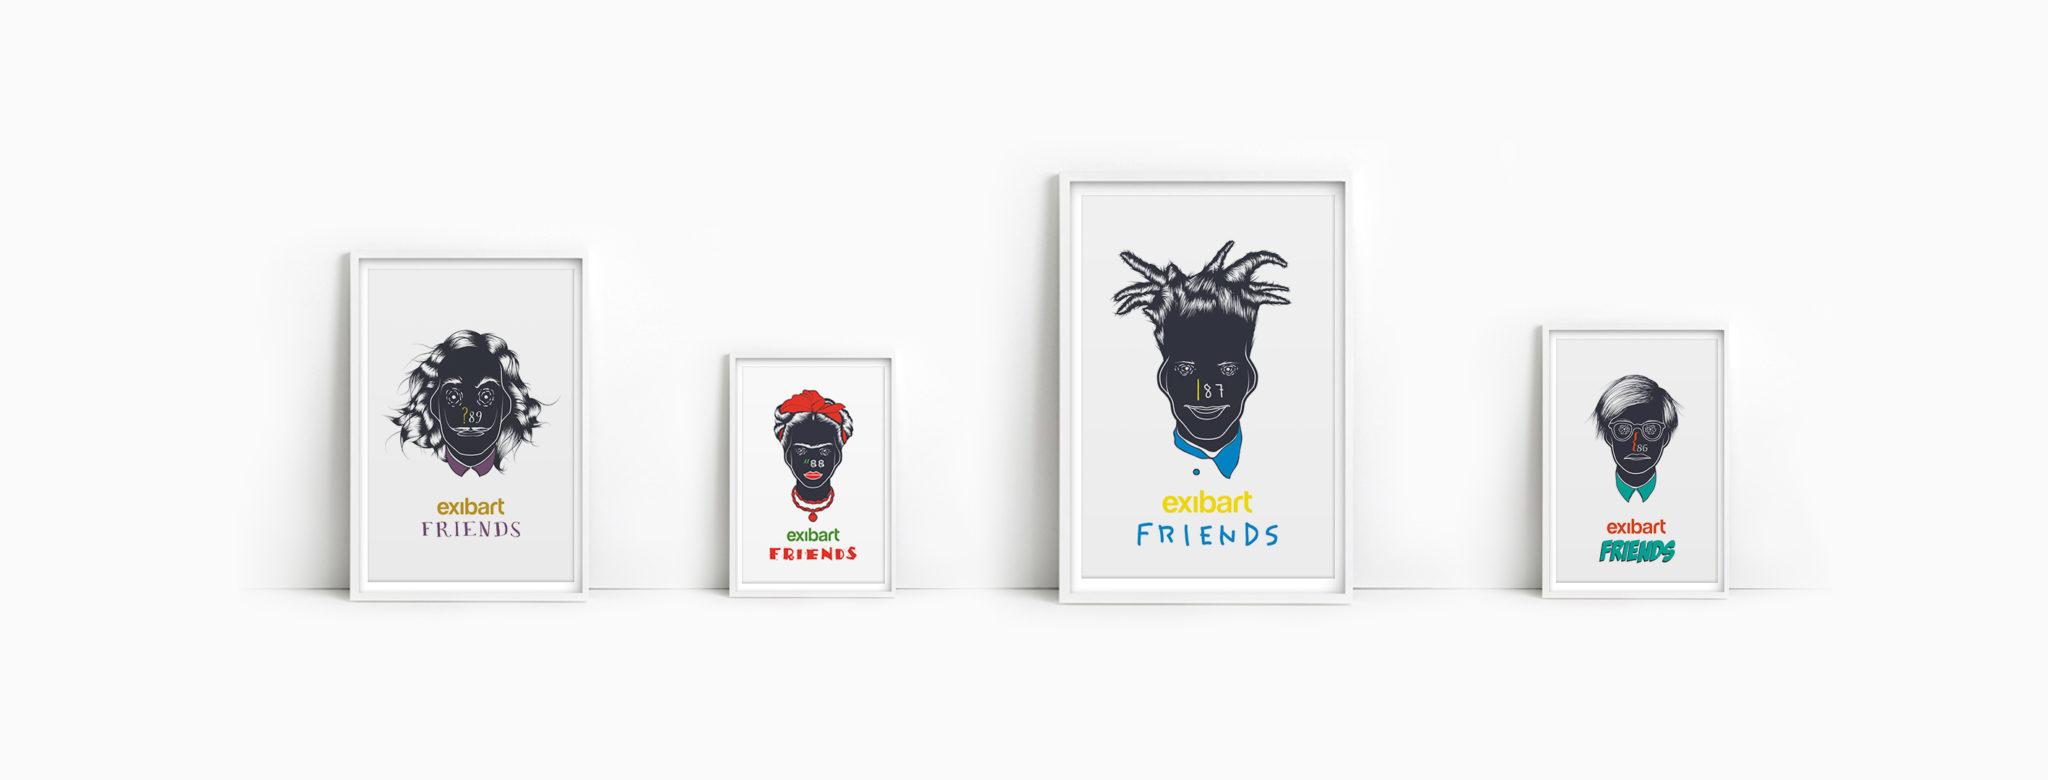 fabio-bevilacqua-exibart-friends-v1